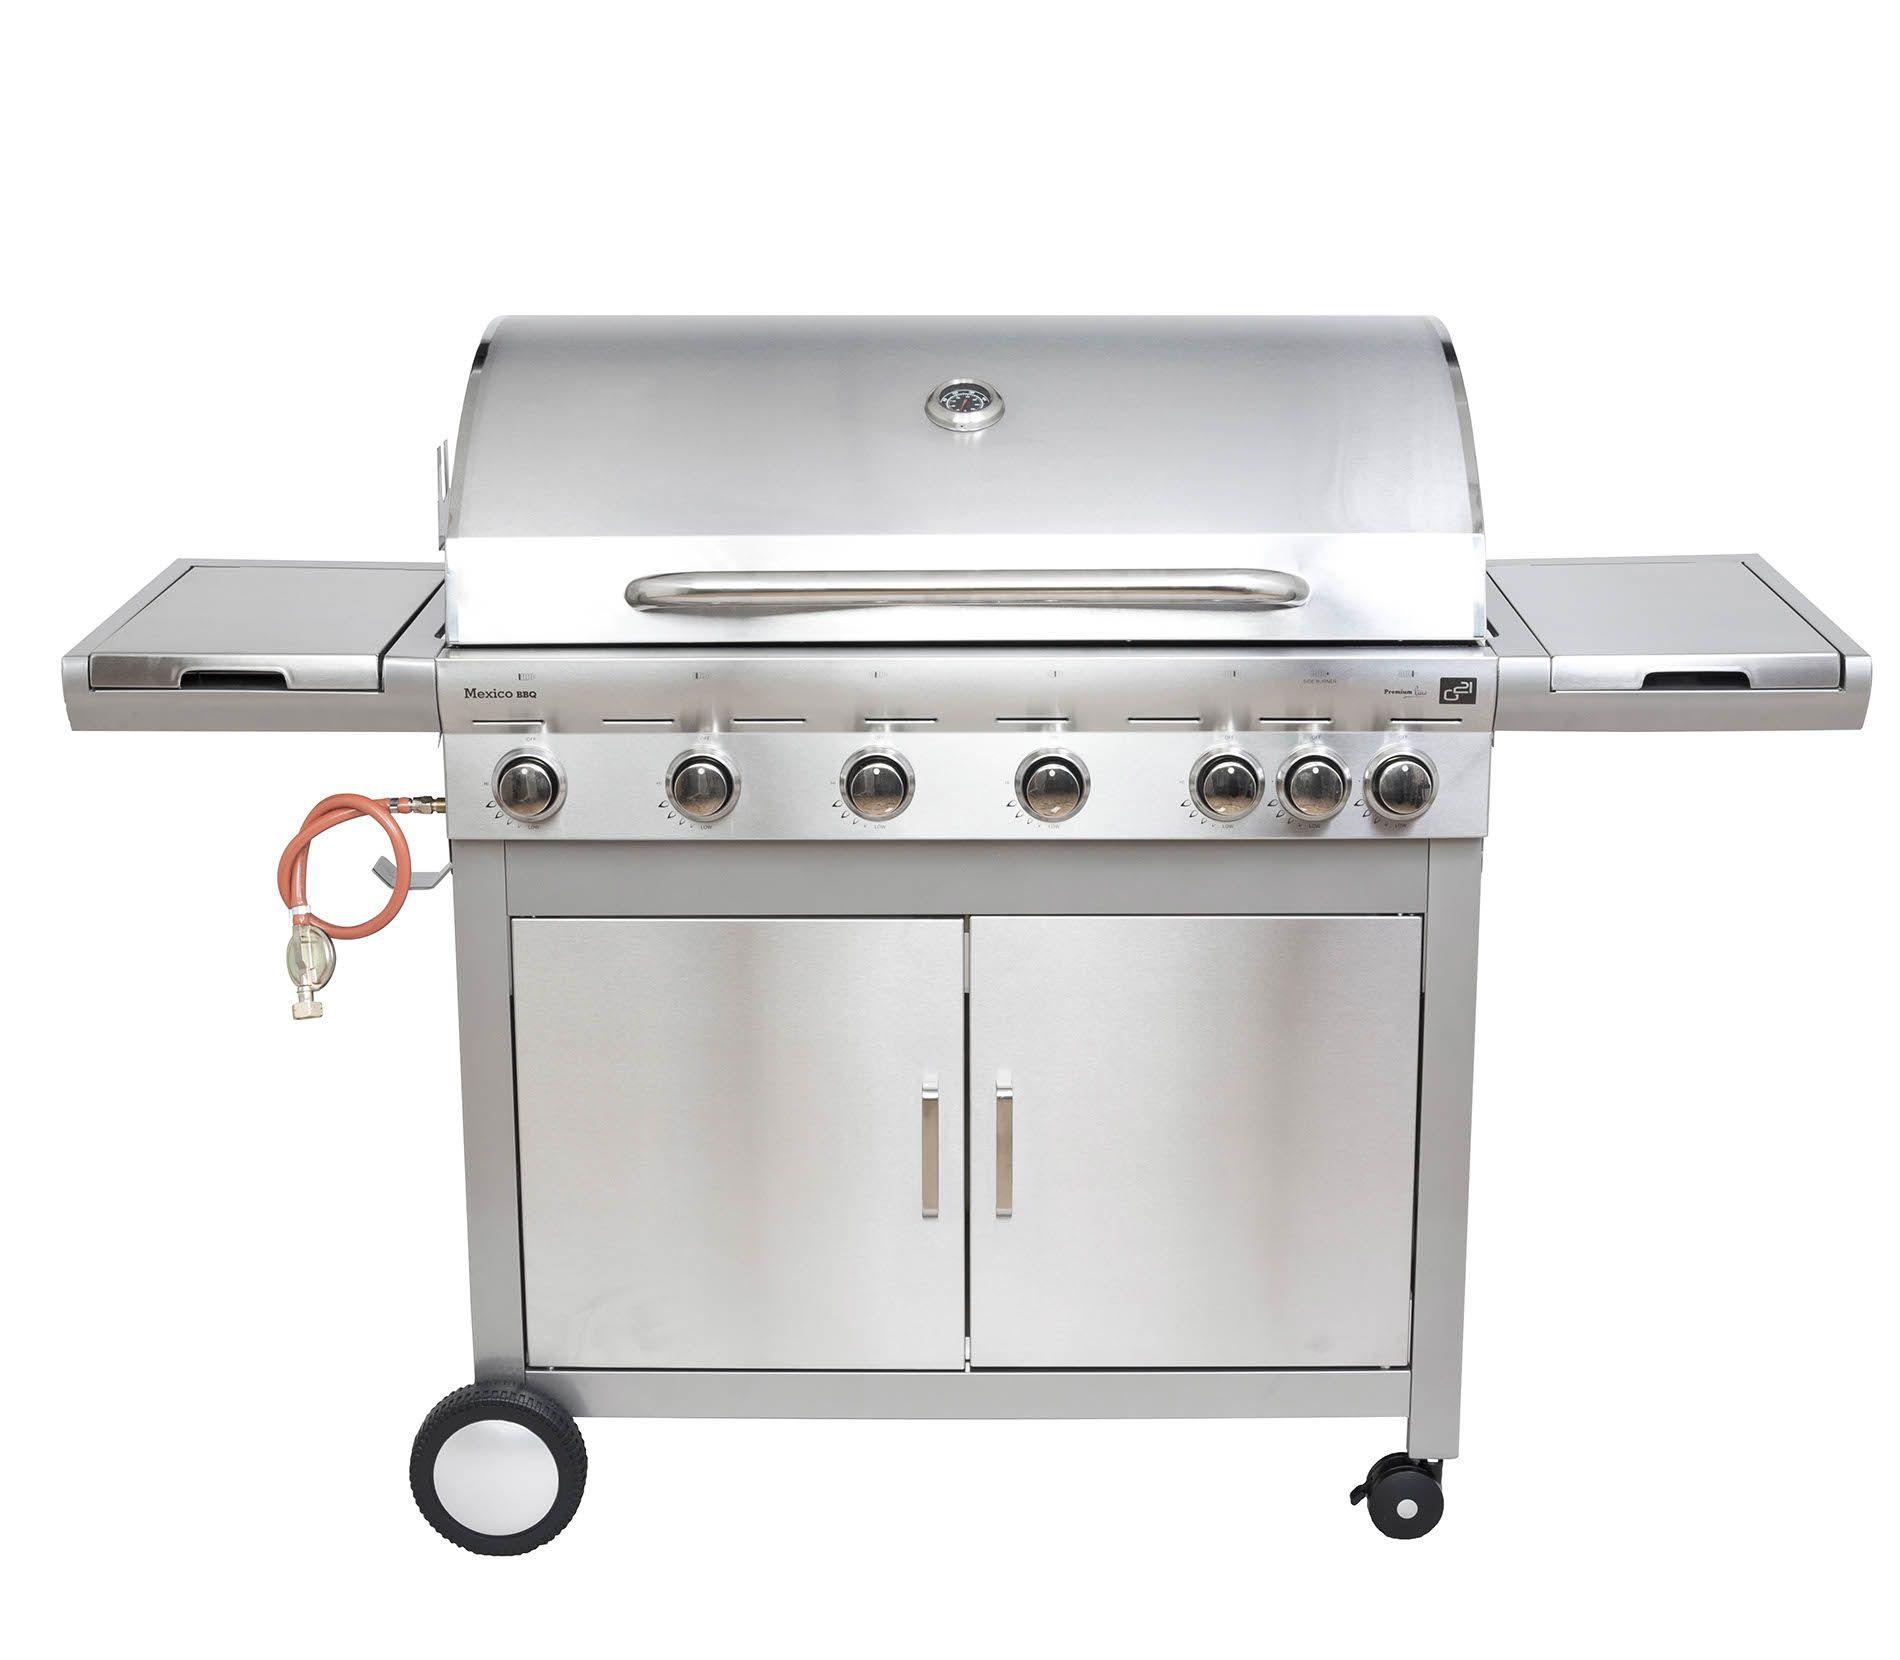 Grill gazowy G21 Mexico, BBQ Premium Line